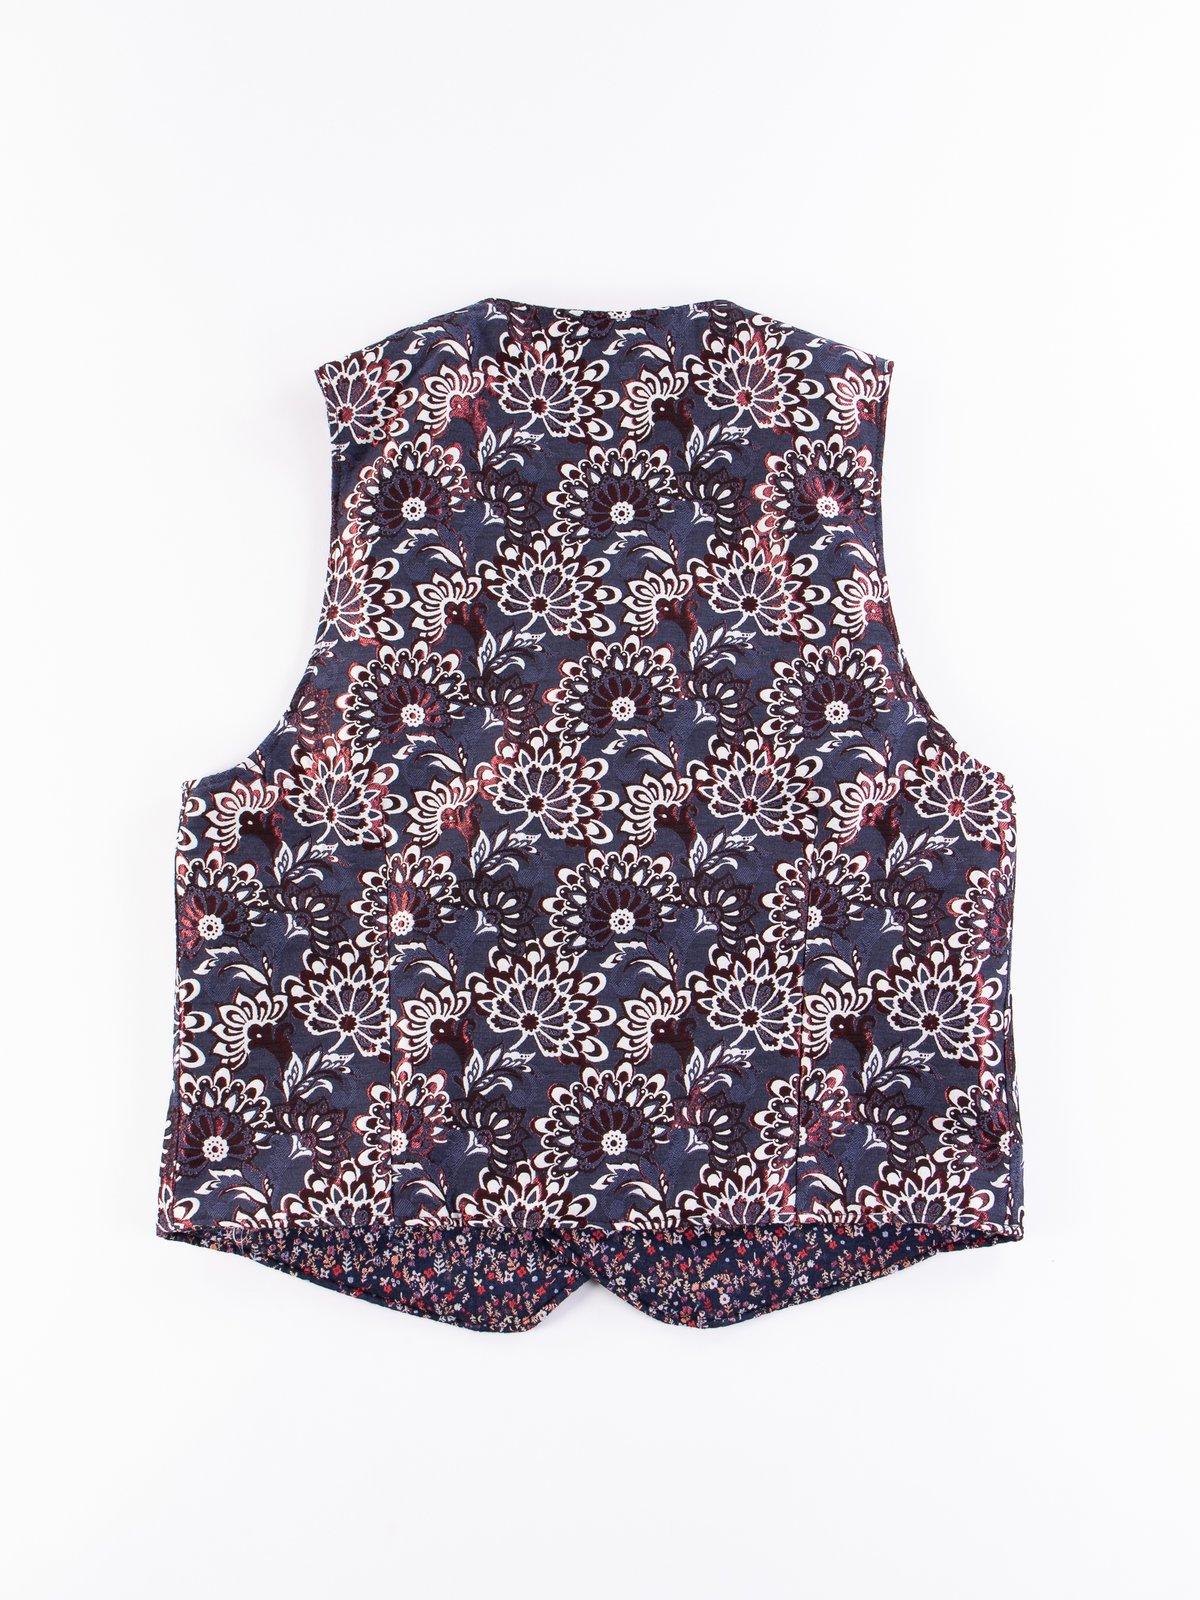 Navy Polyester Mini Floral Jacquard Reversible Vest - Image 7